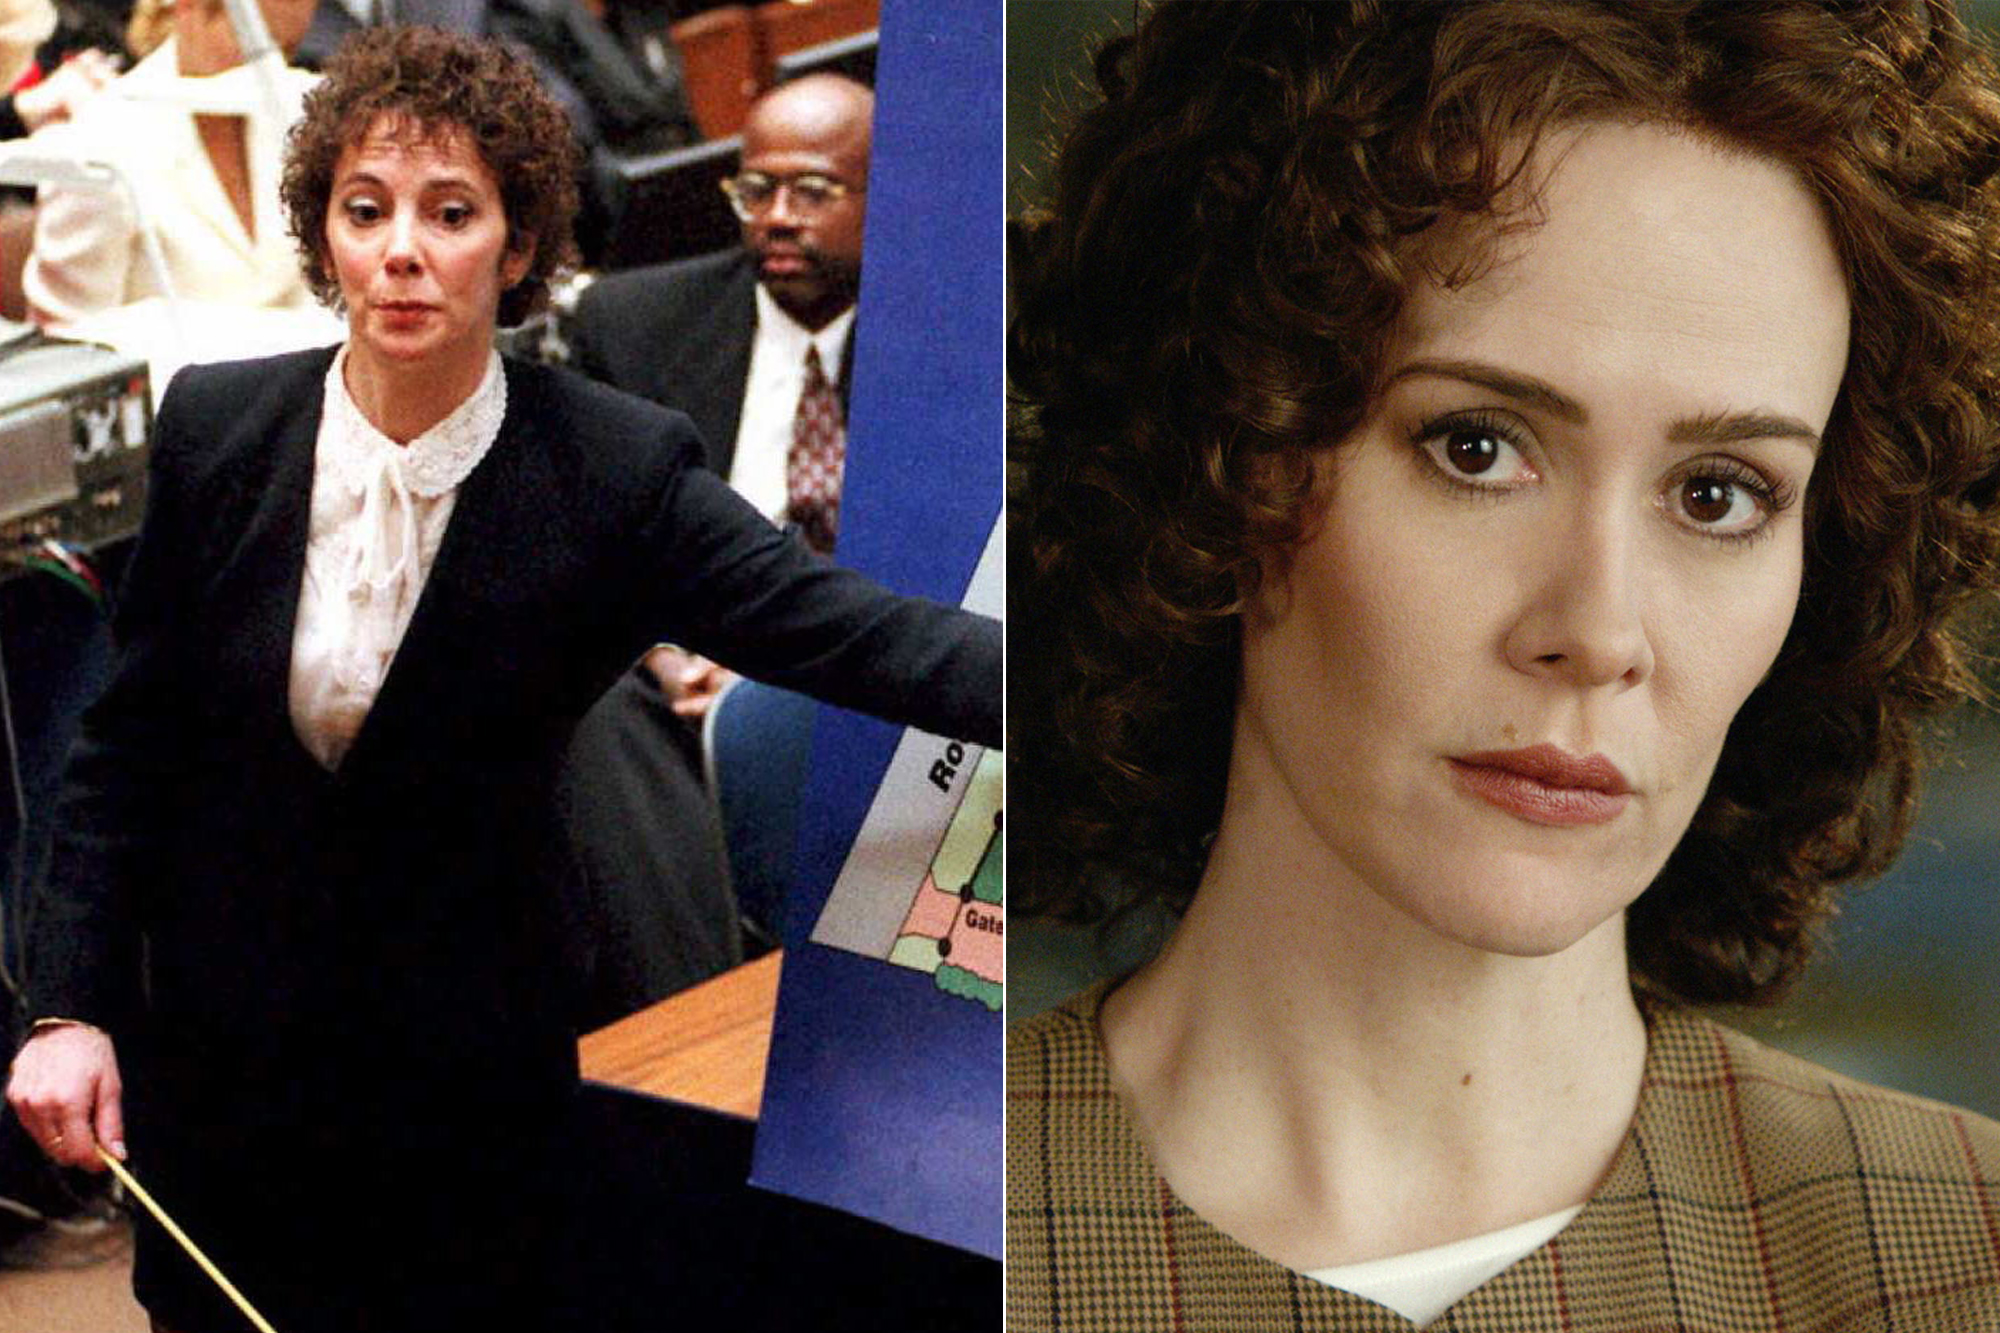 Left: Prosecutor Marcia Clark; Right: Sarah Paulson.